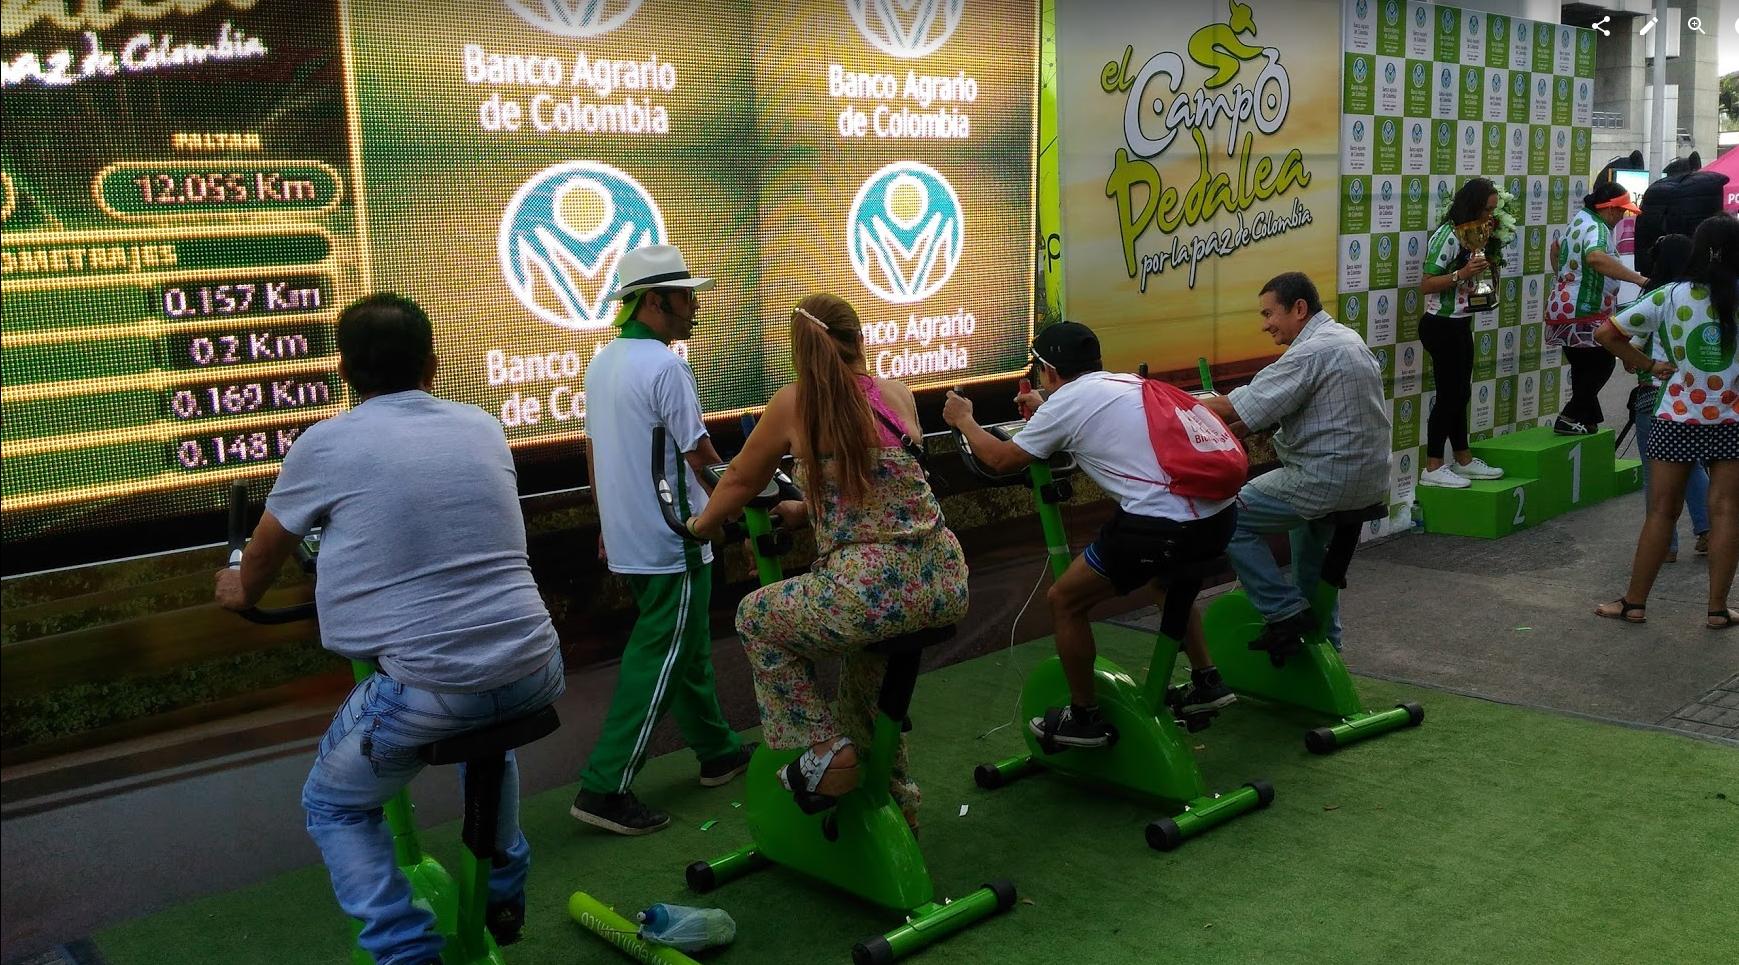 Vuelta a Colombia 2016 - Página 2 D4c444aba5ba477baa3ff4634cd5da62